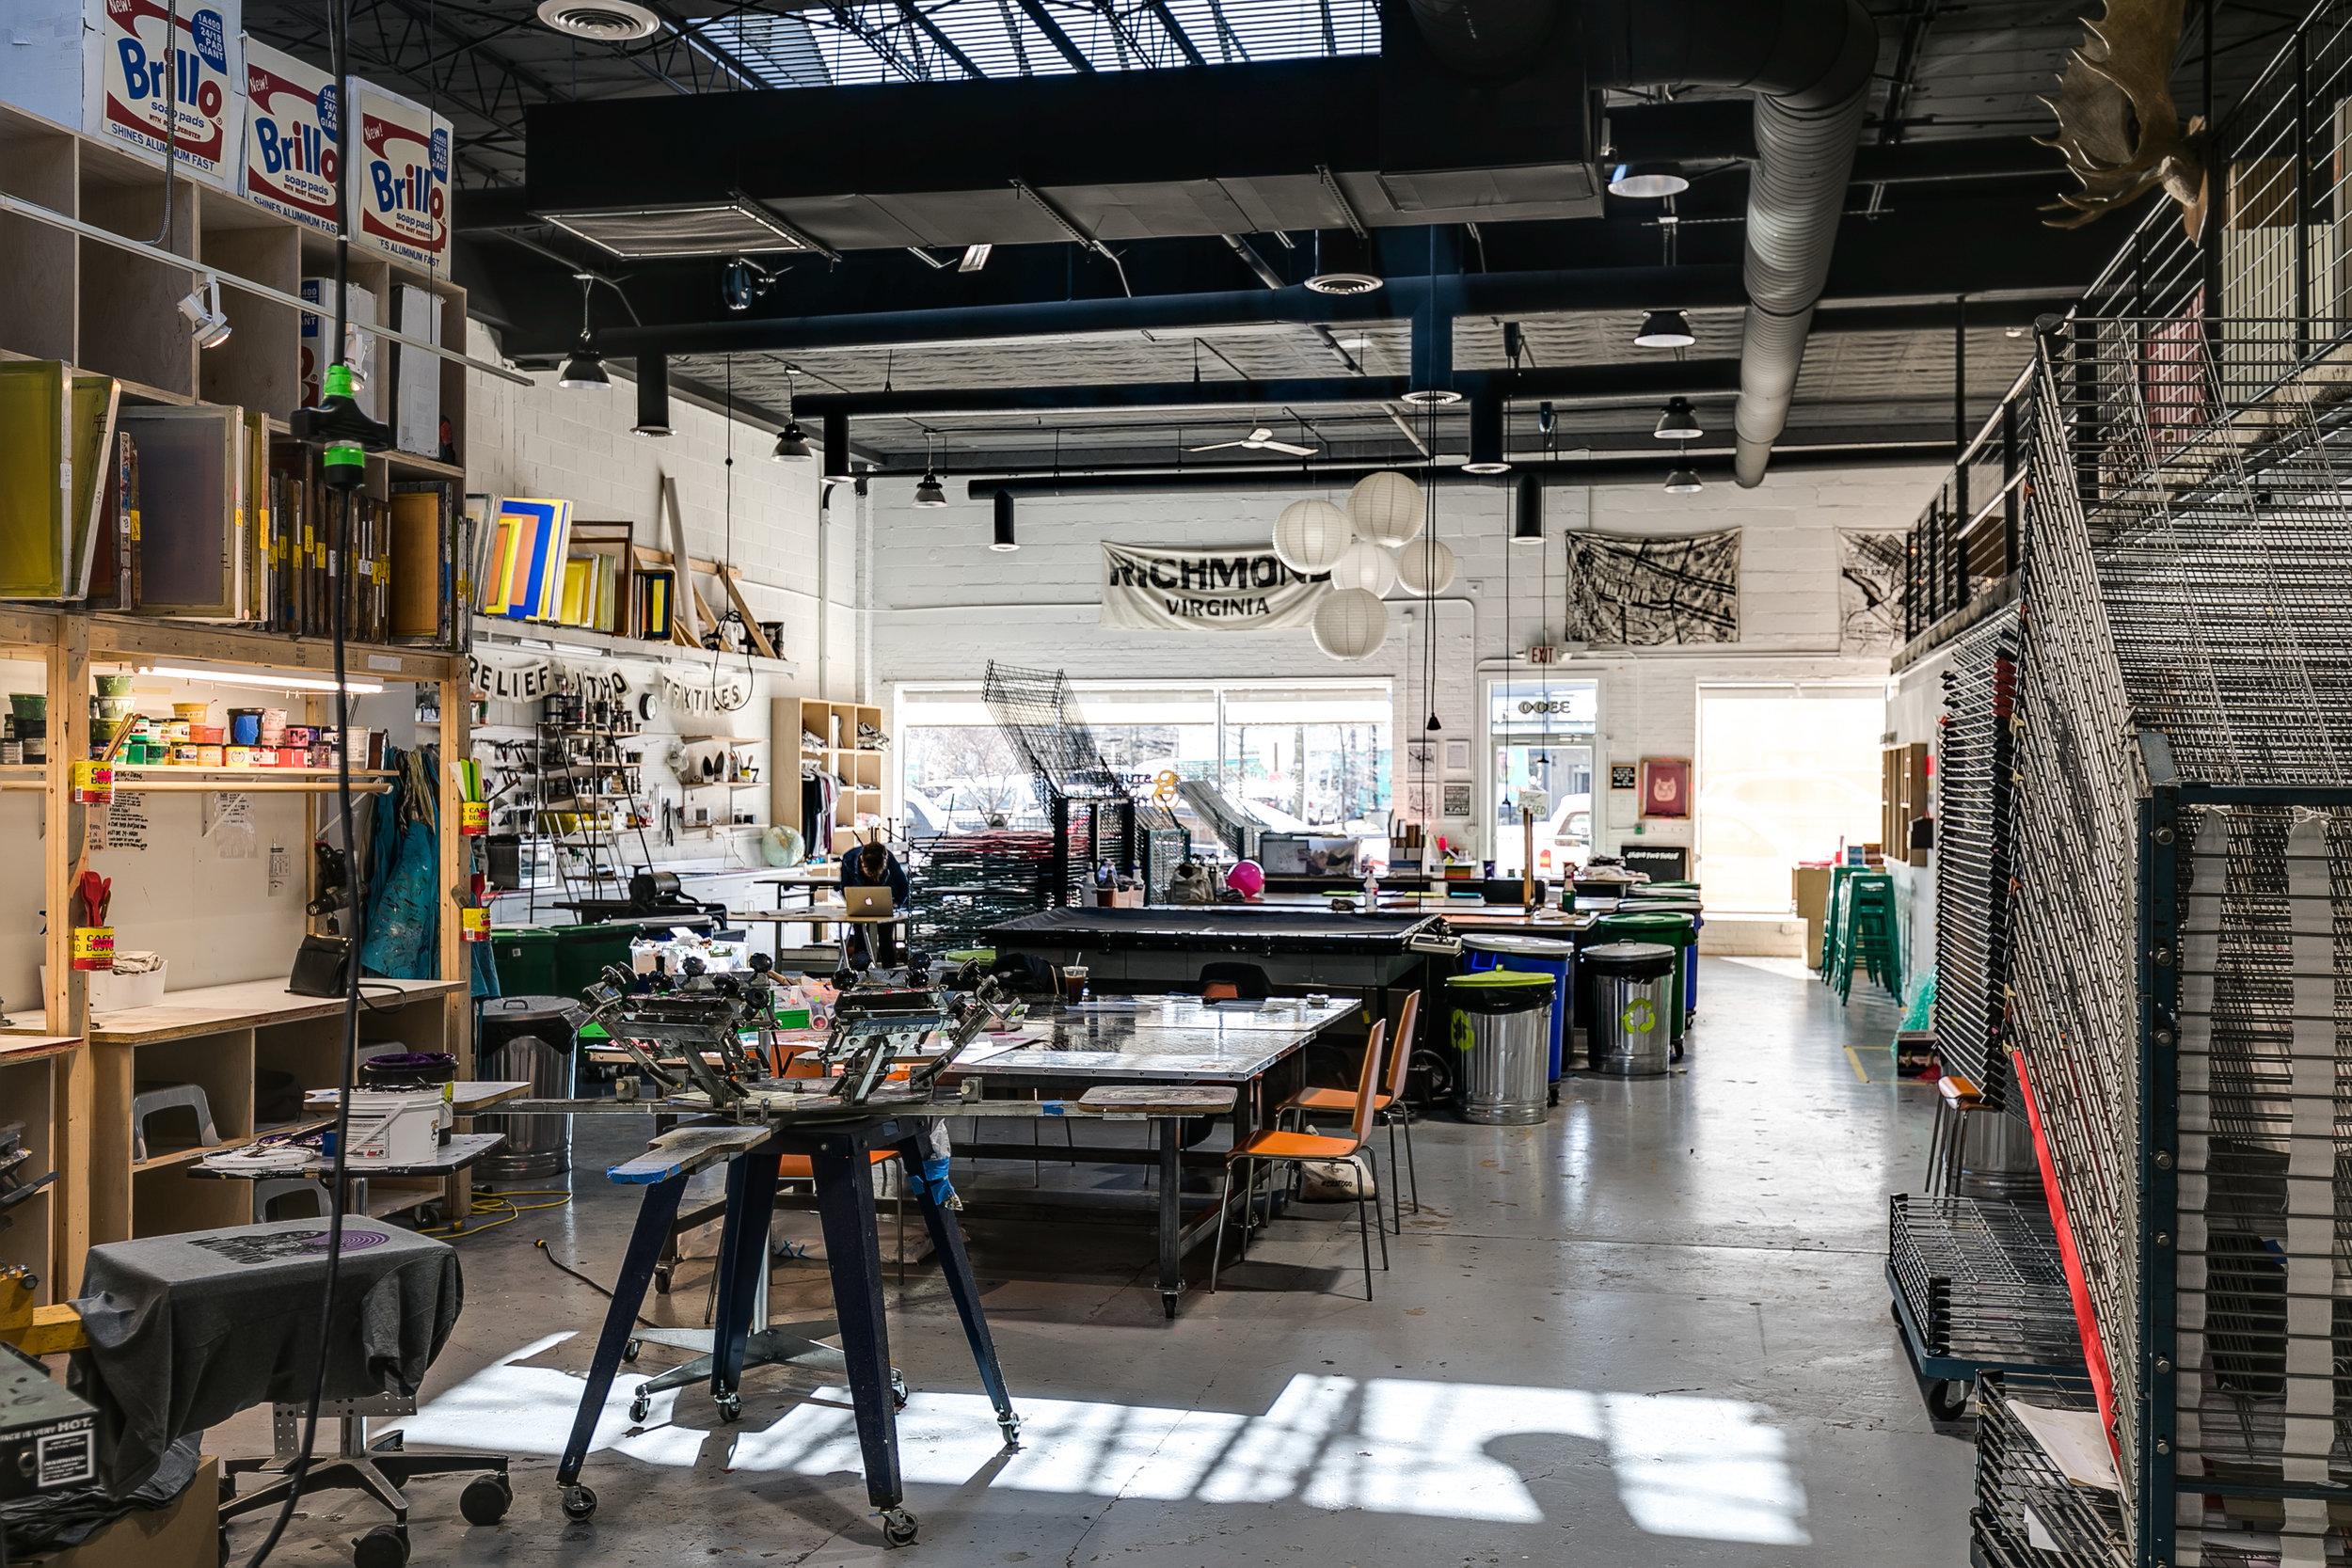 Studio Two Three | art studios | print shop | darkroom | Richmond Virginia